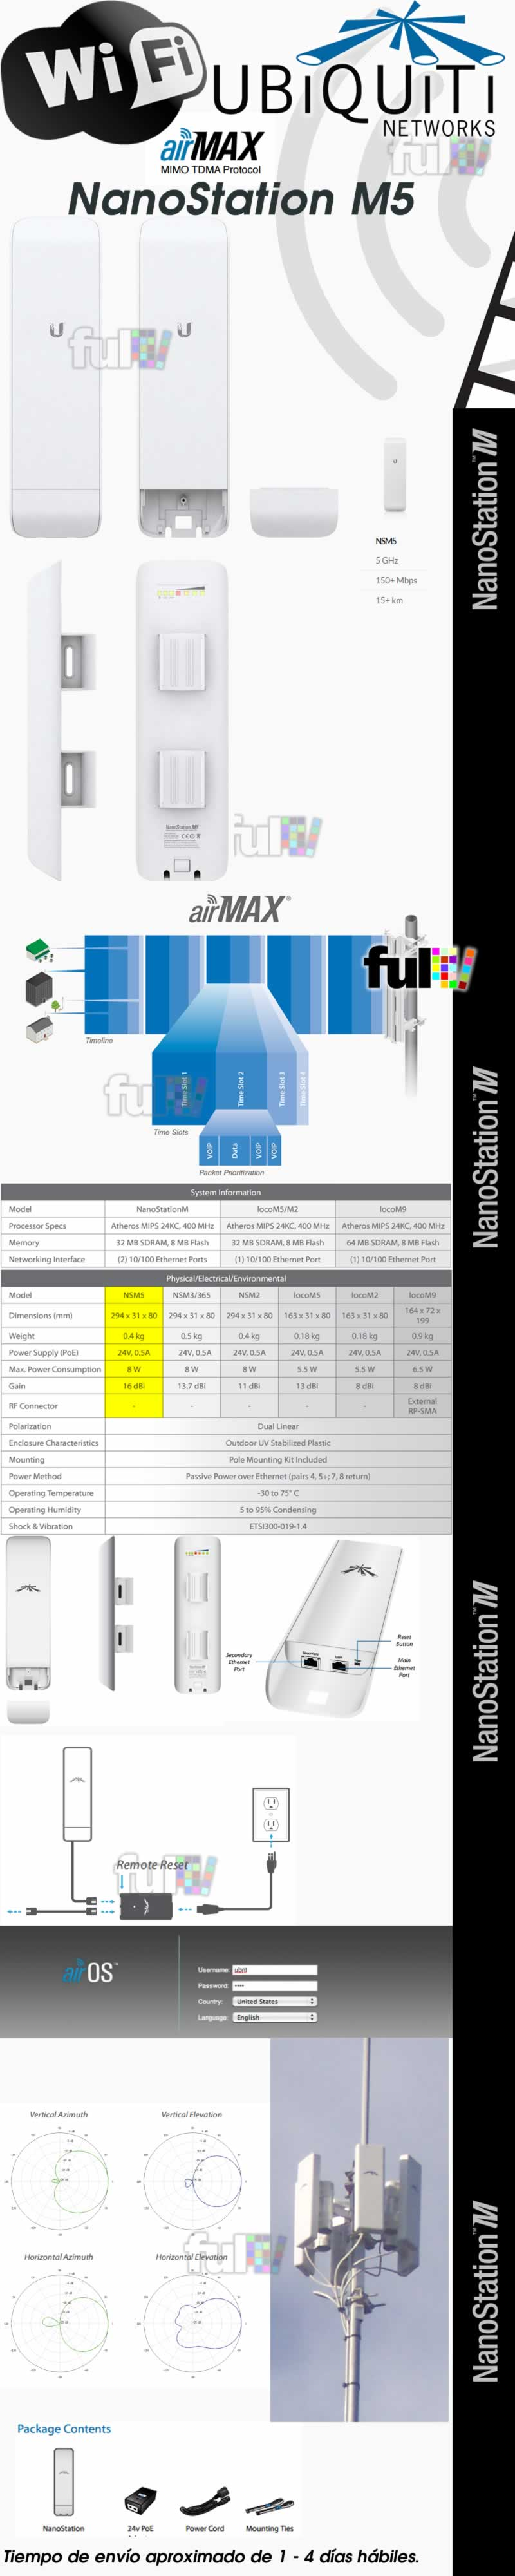 Nanostation M2 Ubiquiti Airos Airmax 5 Ghz